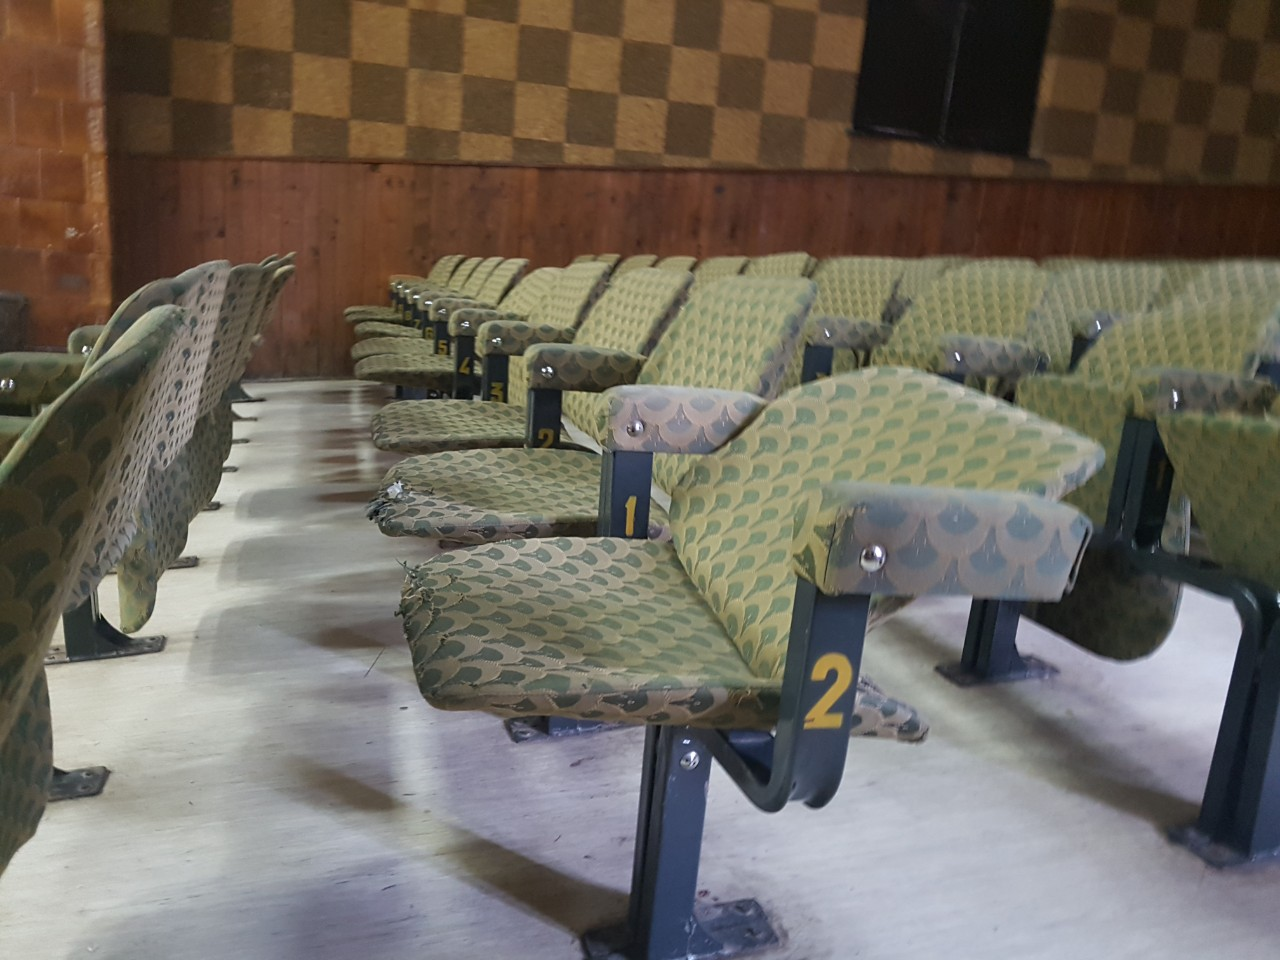 Sedišta u bioskopskoj sali, foto: M.M.